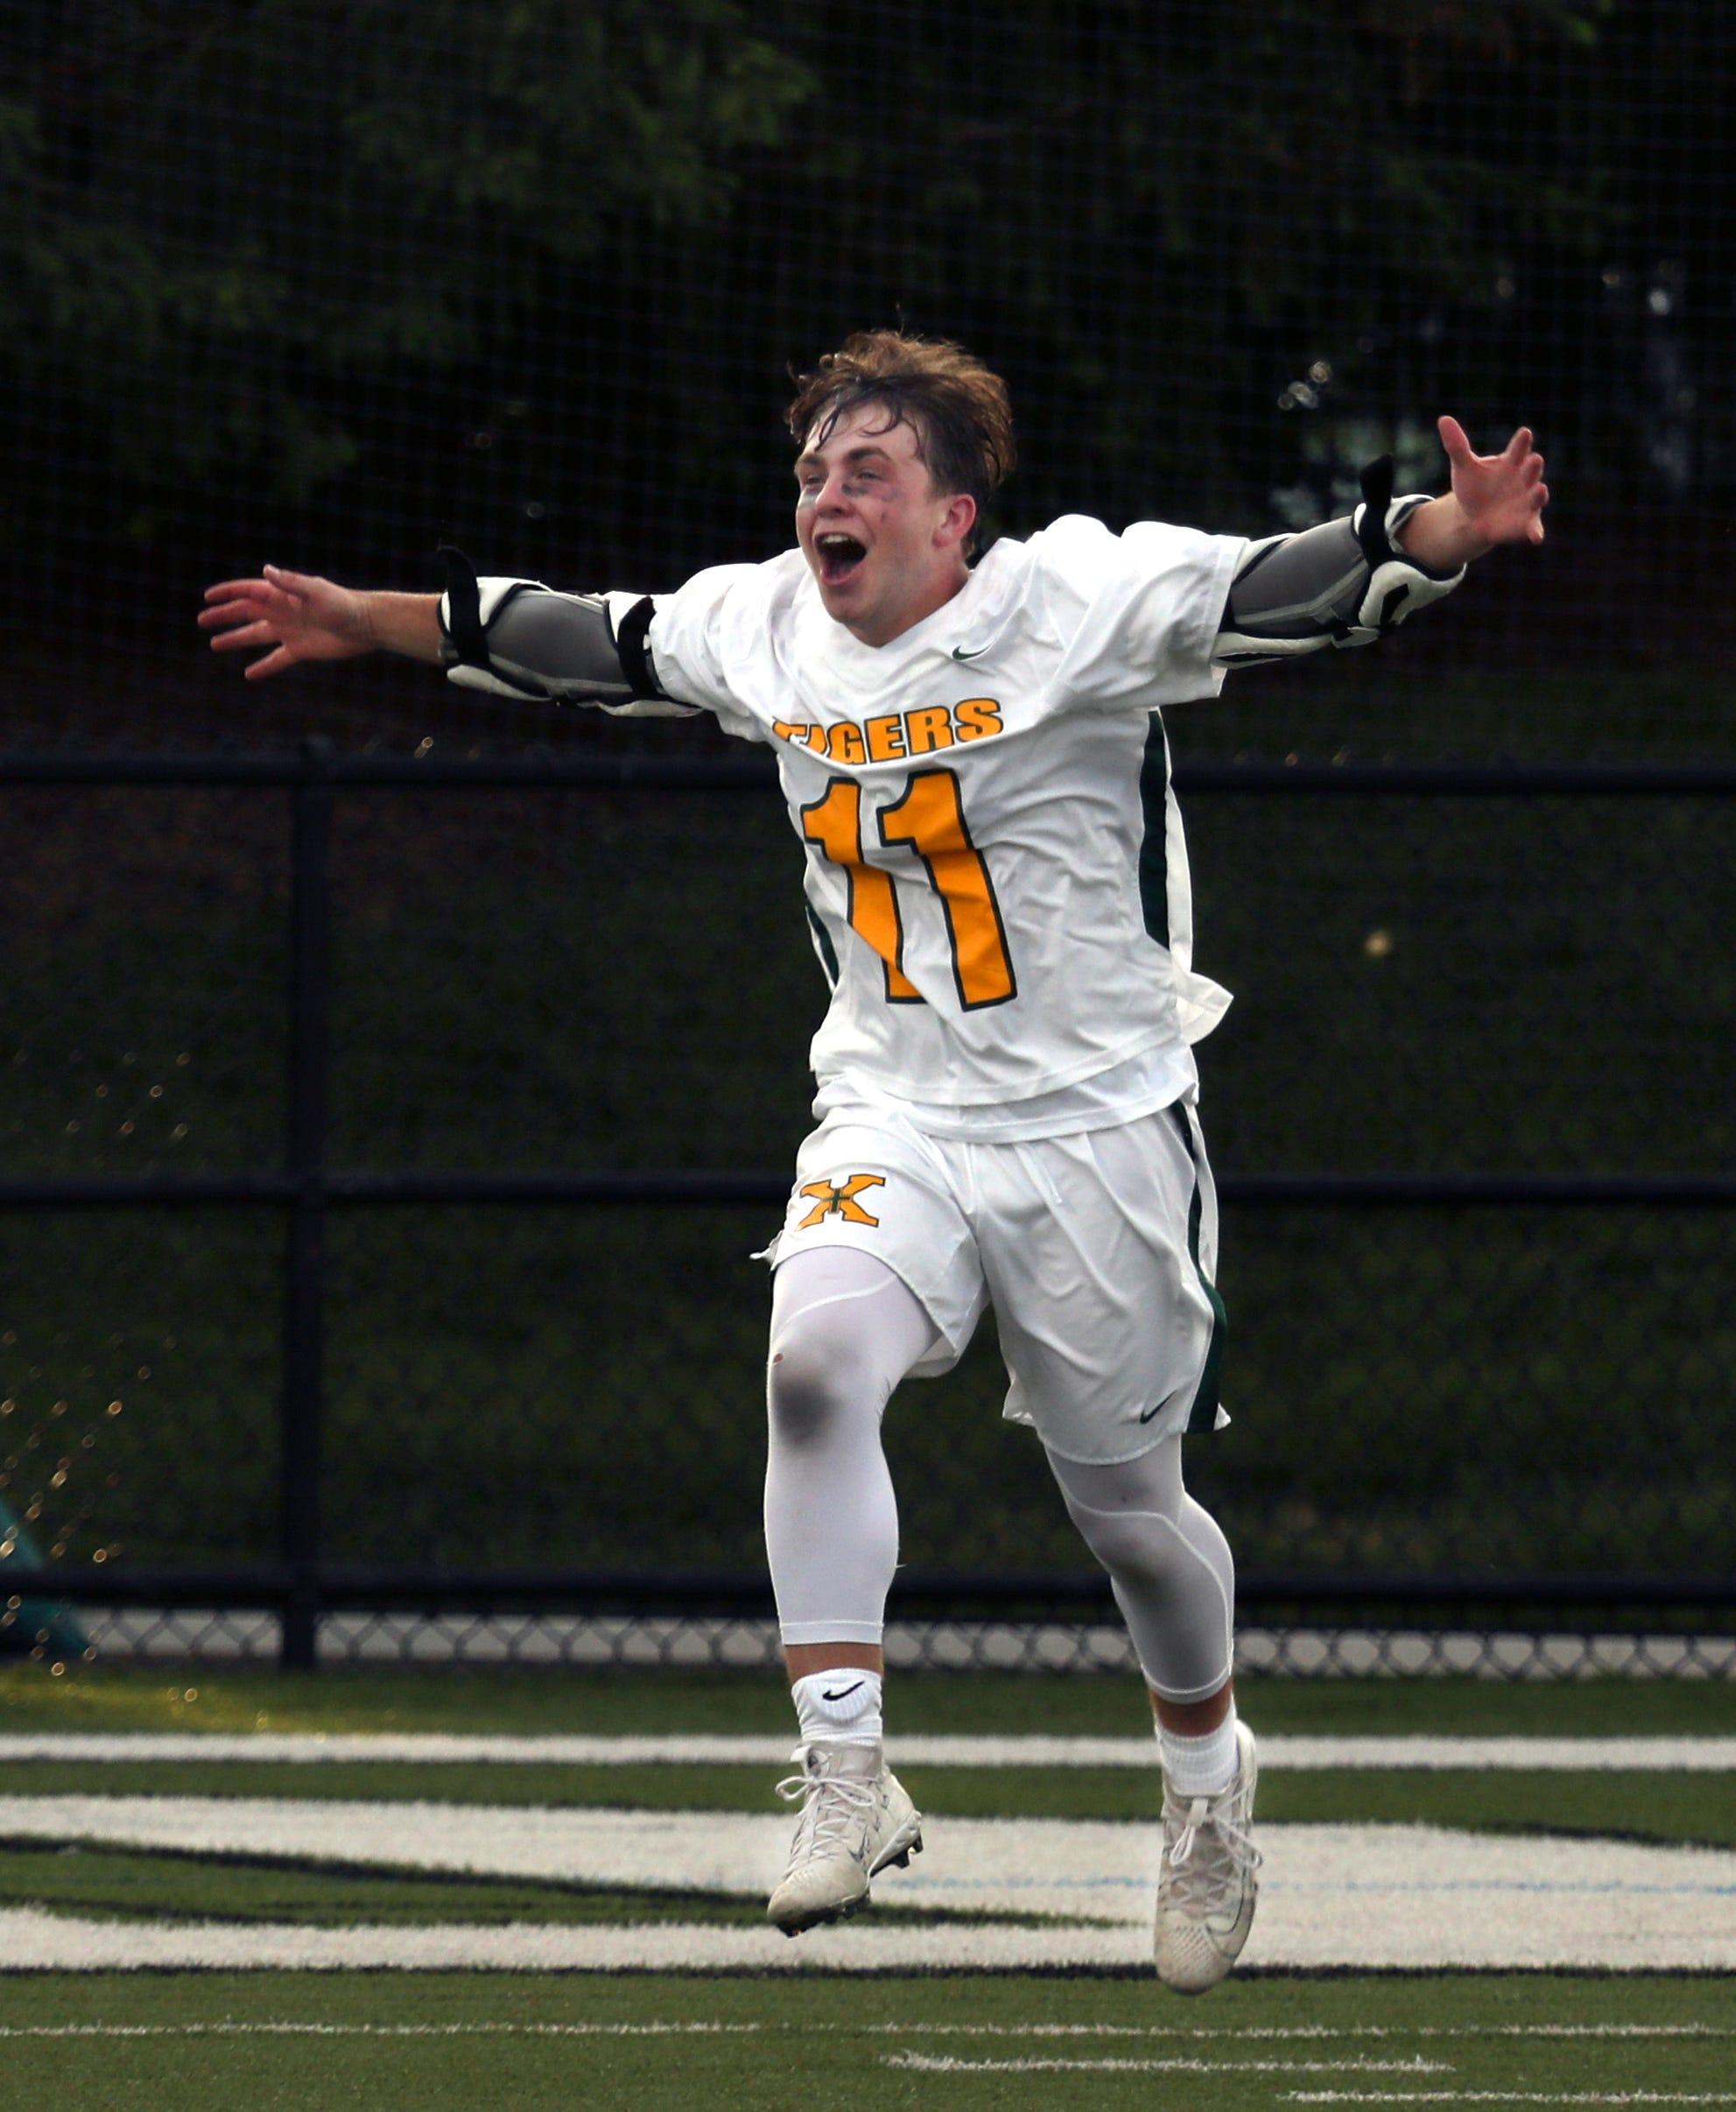 St. Xavier beats Trinity to win state boys lacrosse championship